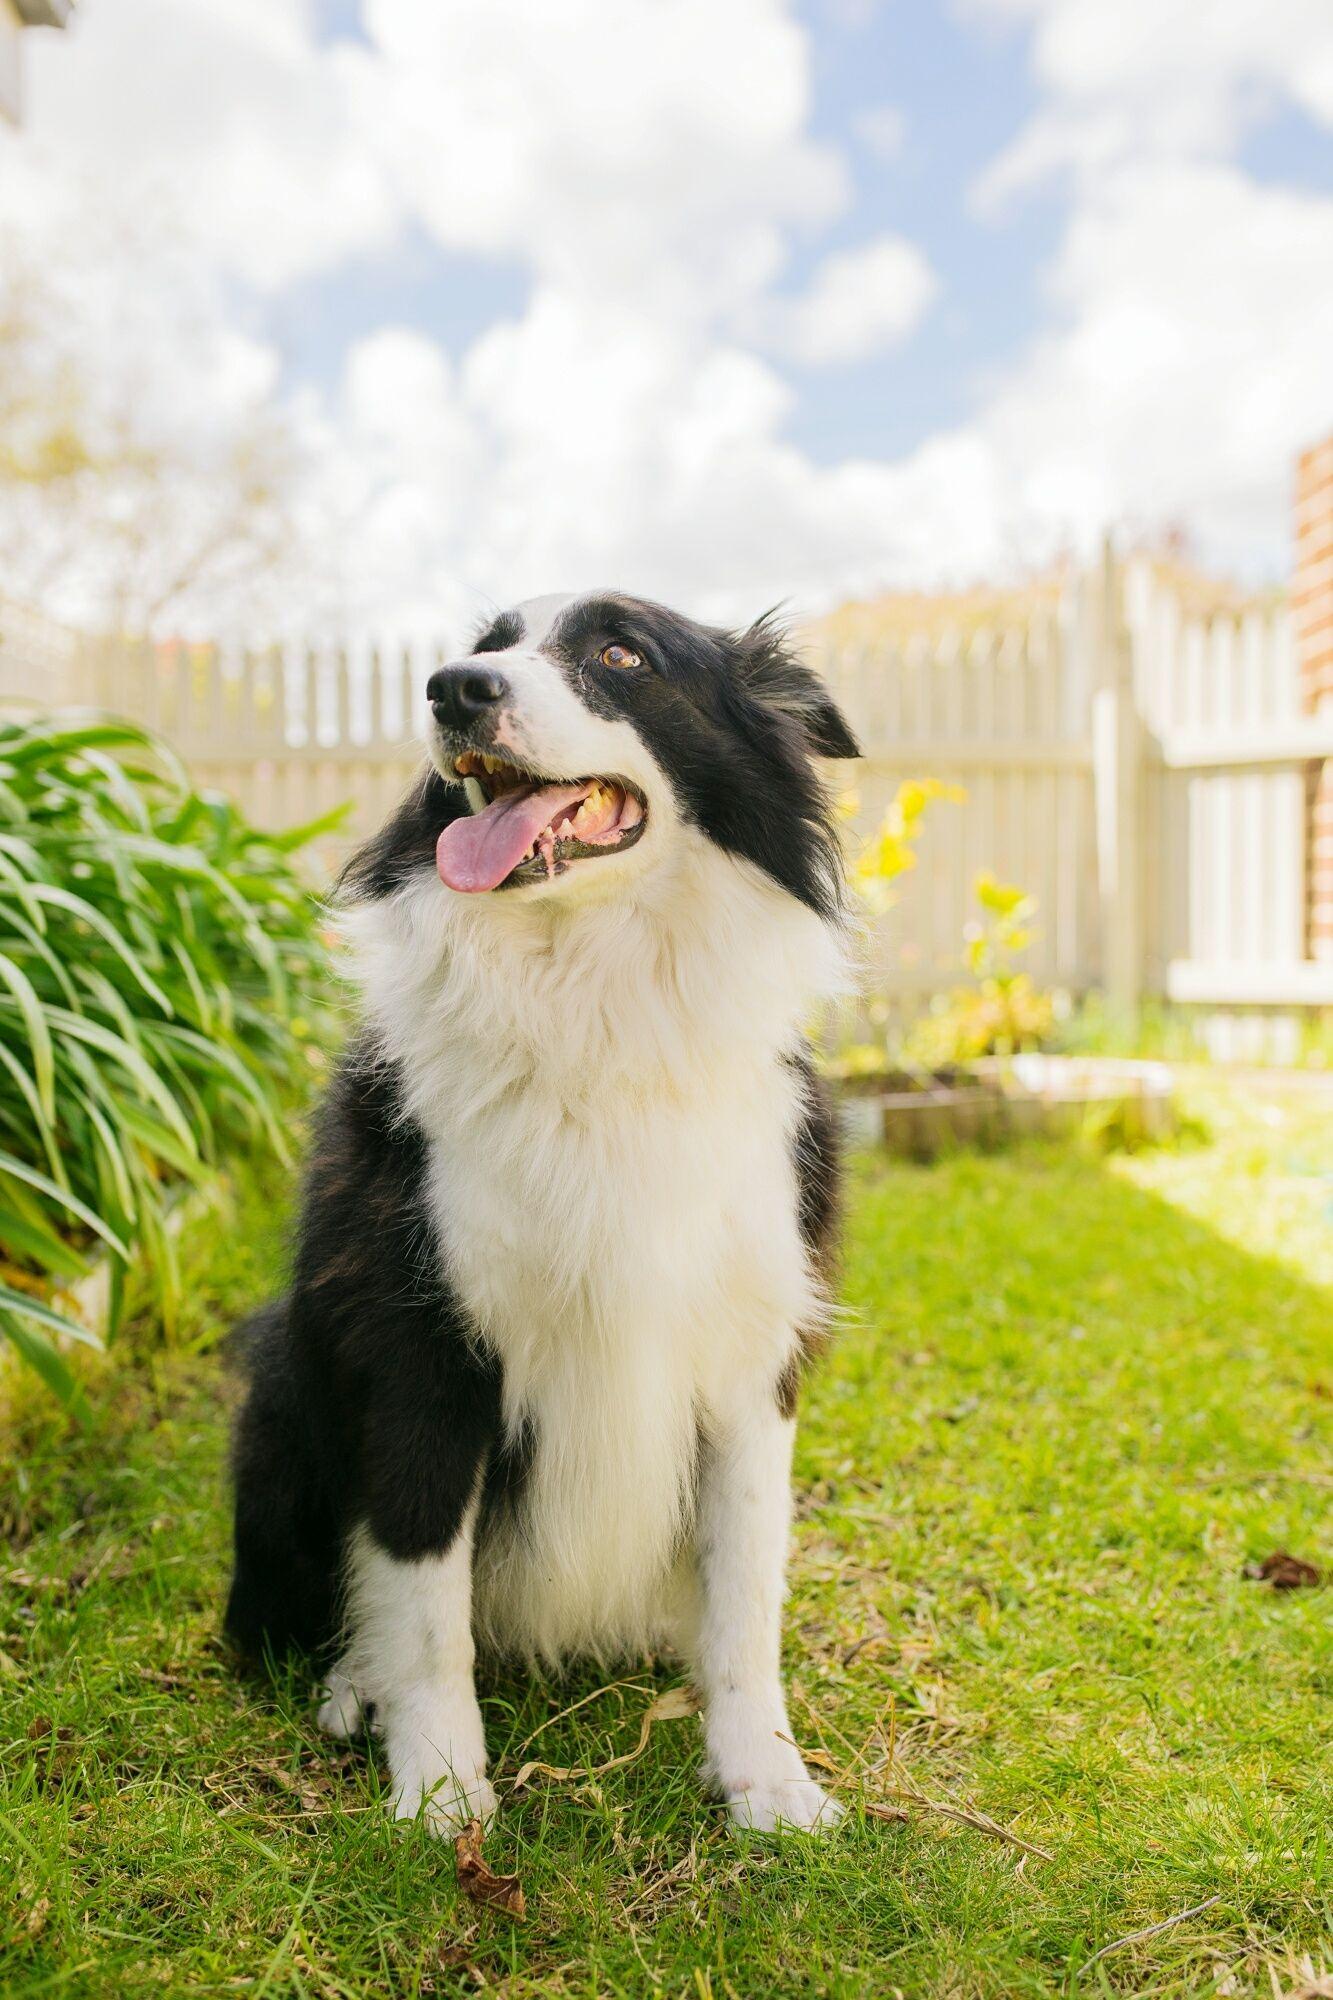 Dog Sticking Out Tongue While Looking Away At Backyard